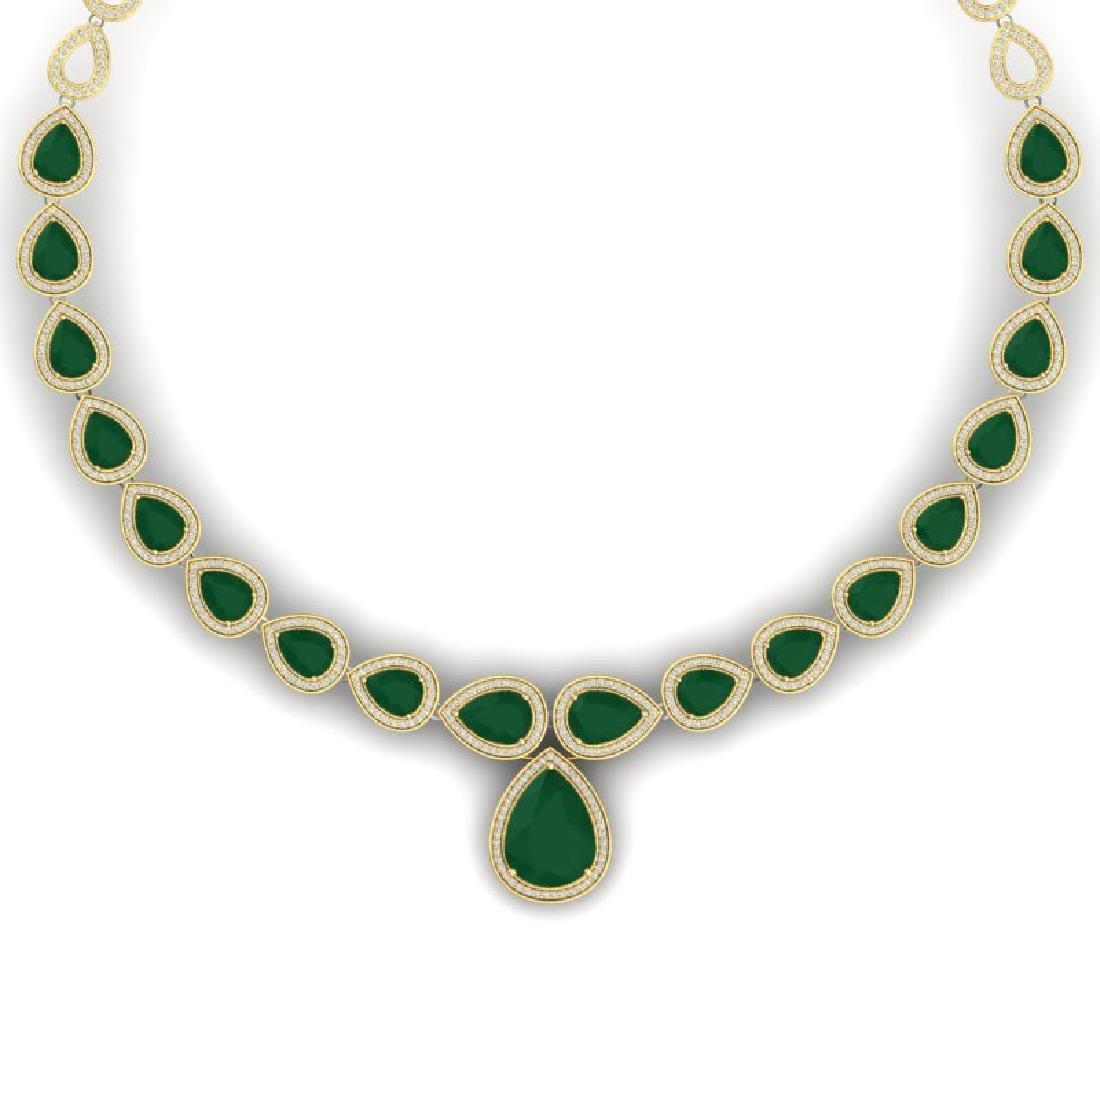 51.41 CTW Royalty Emerald & VS Diamond Necklace 18K